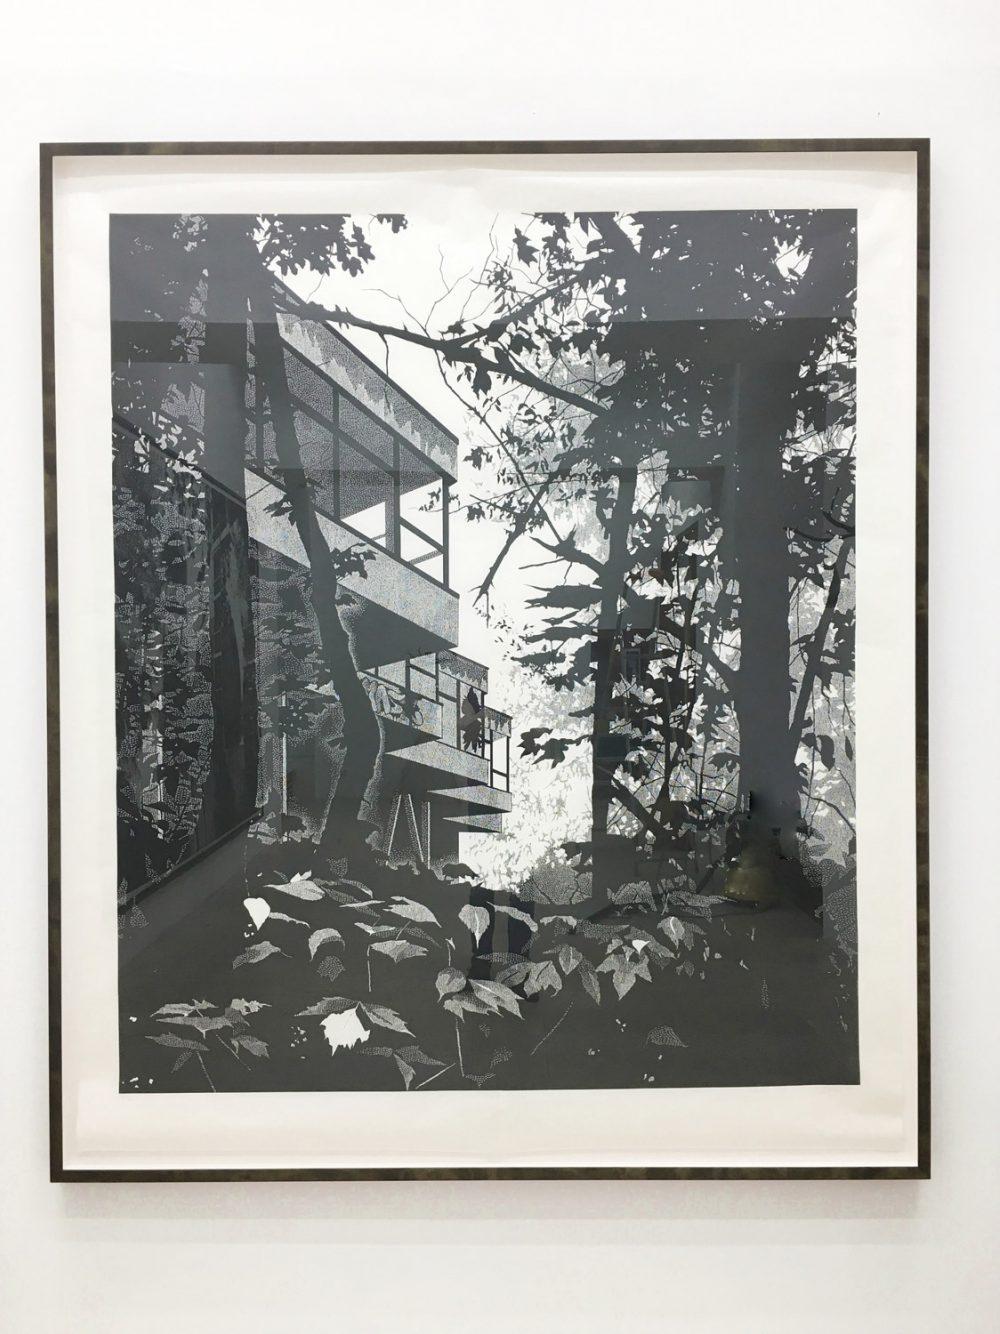 Station (2016), 200 x 170 cm, Linolschnitt auf Kozo-Papier, Ed. 5